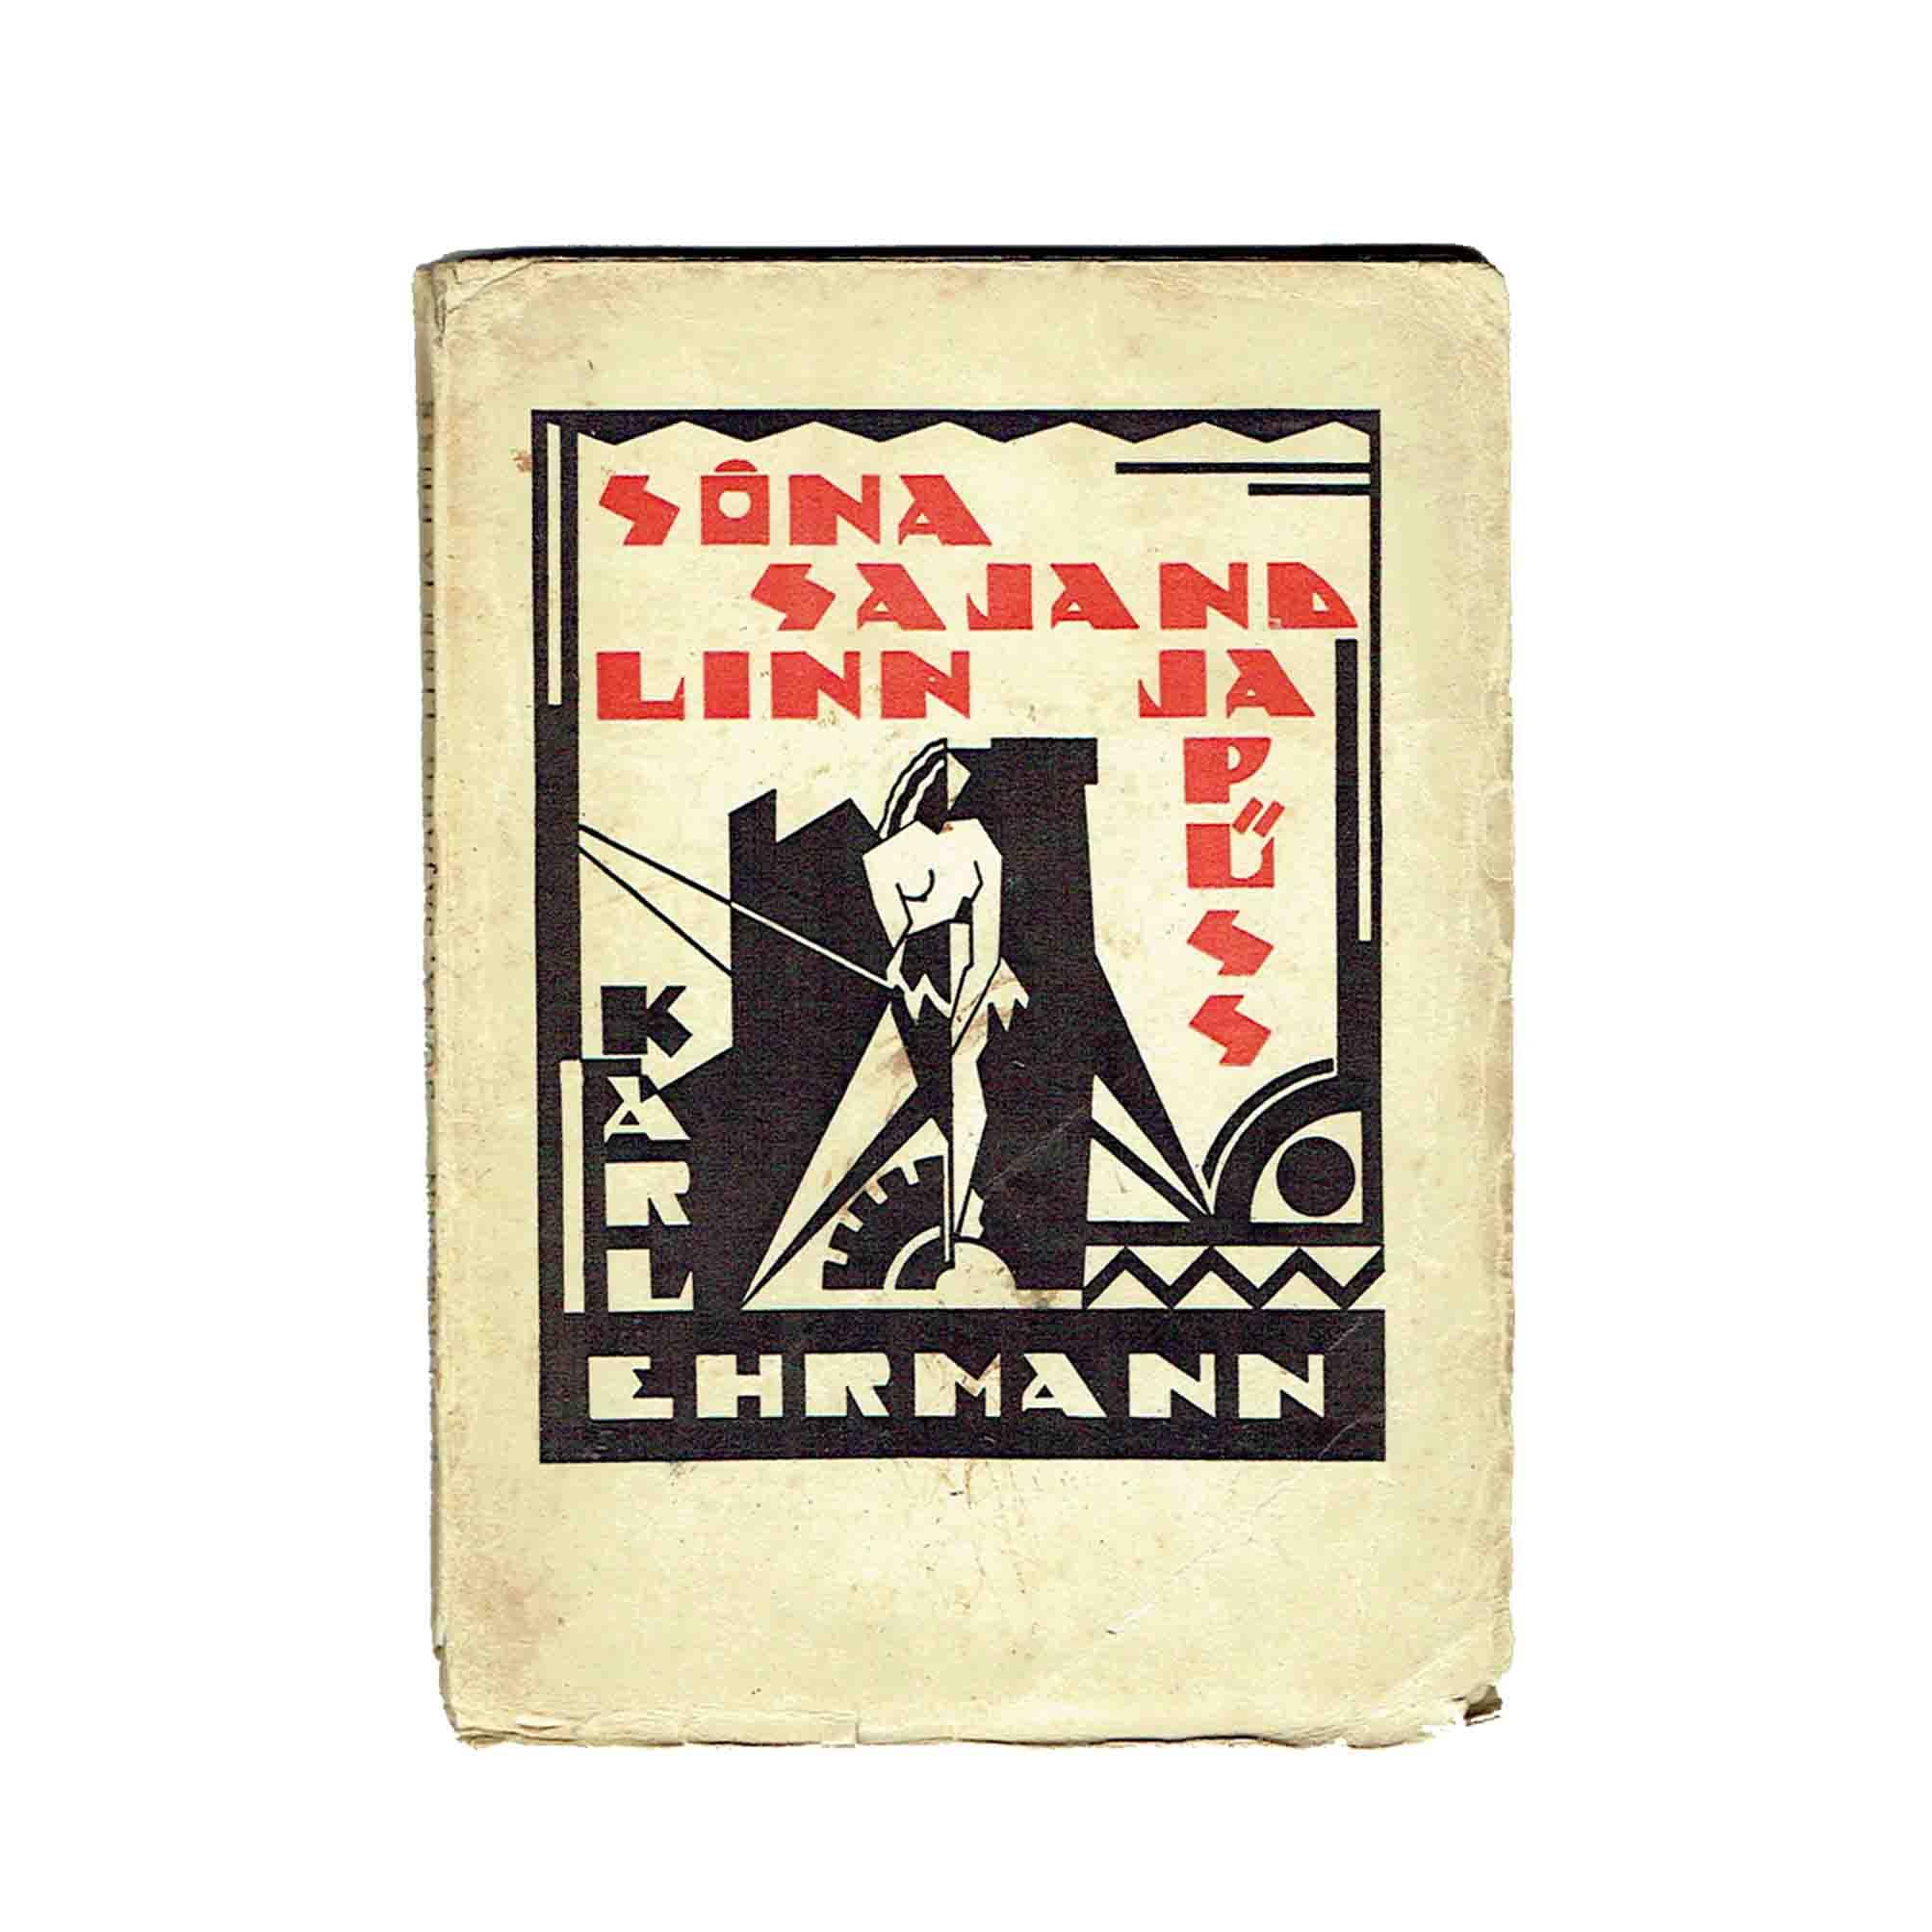 5829K Ehrmann Jaaska Sona1927 Umschlag recto frei N